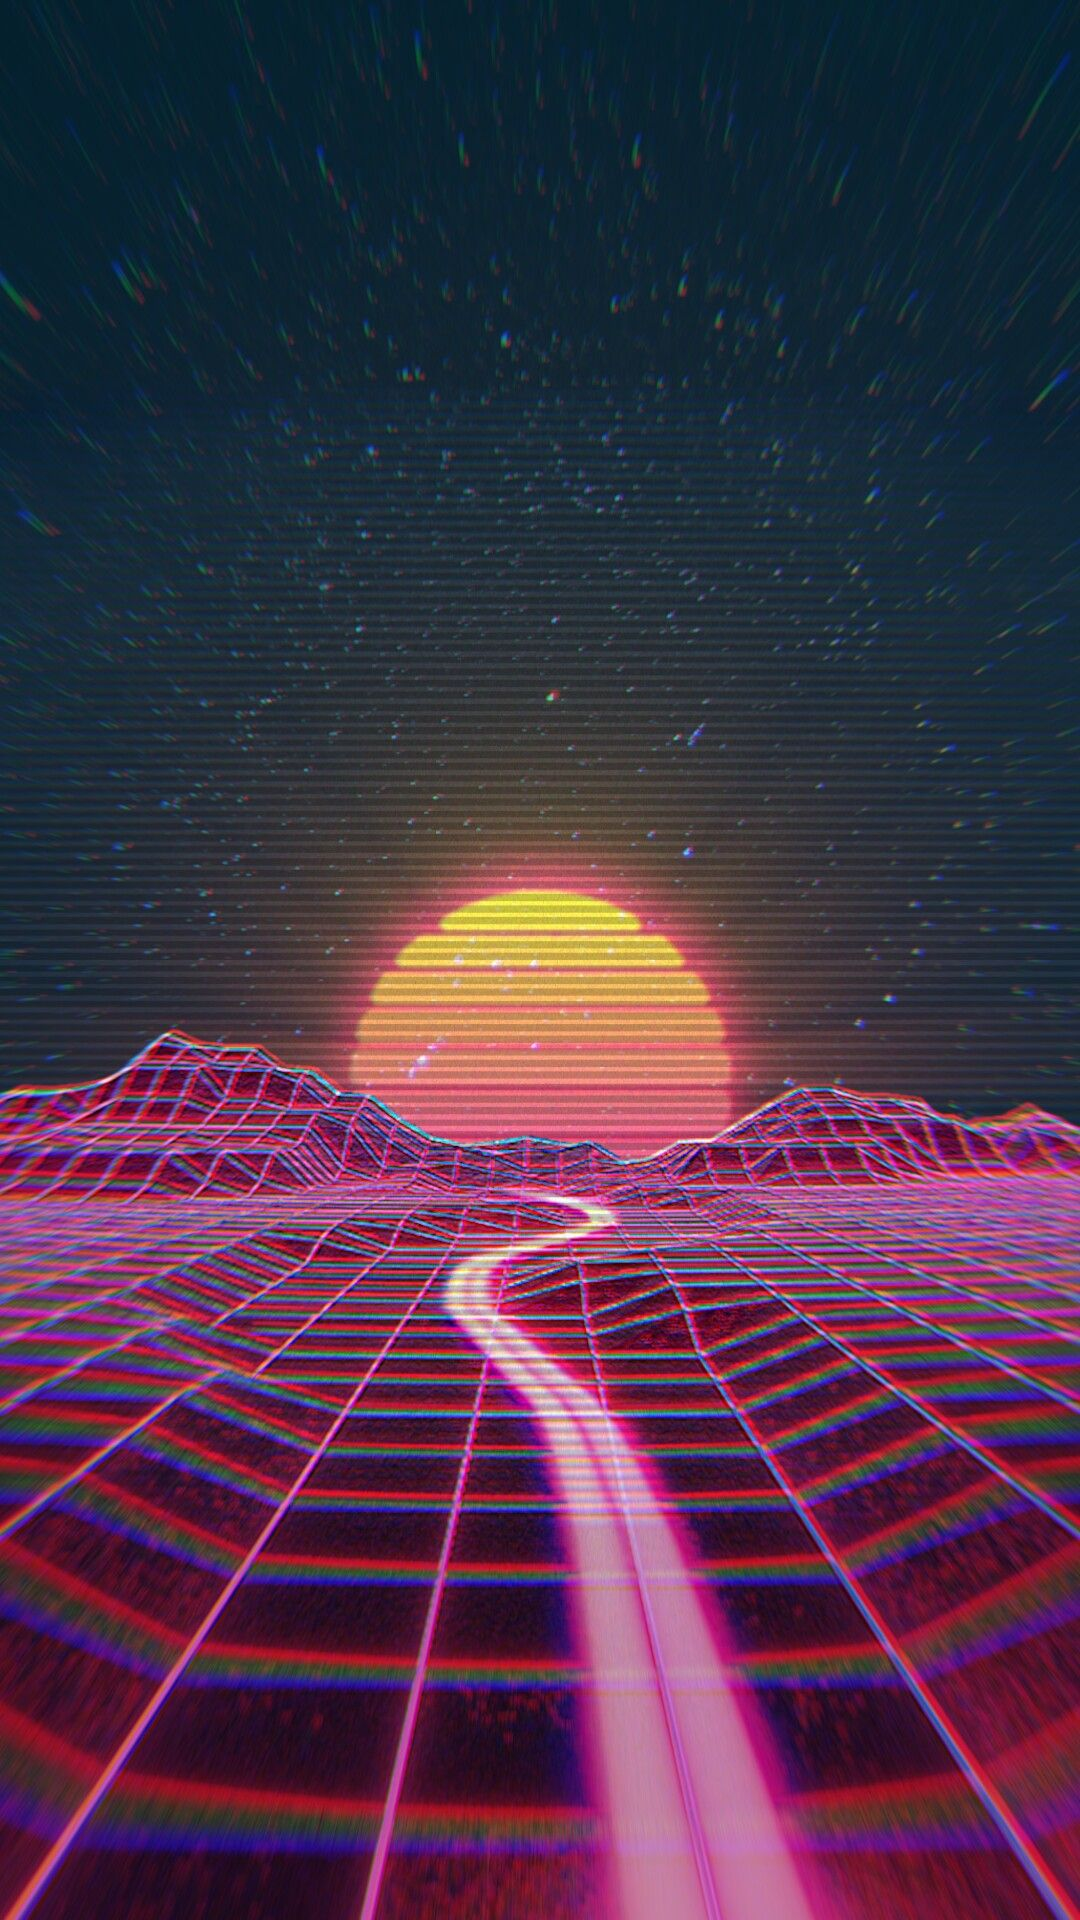 Retro wave synth wave Neon Wave Pinterest Retro